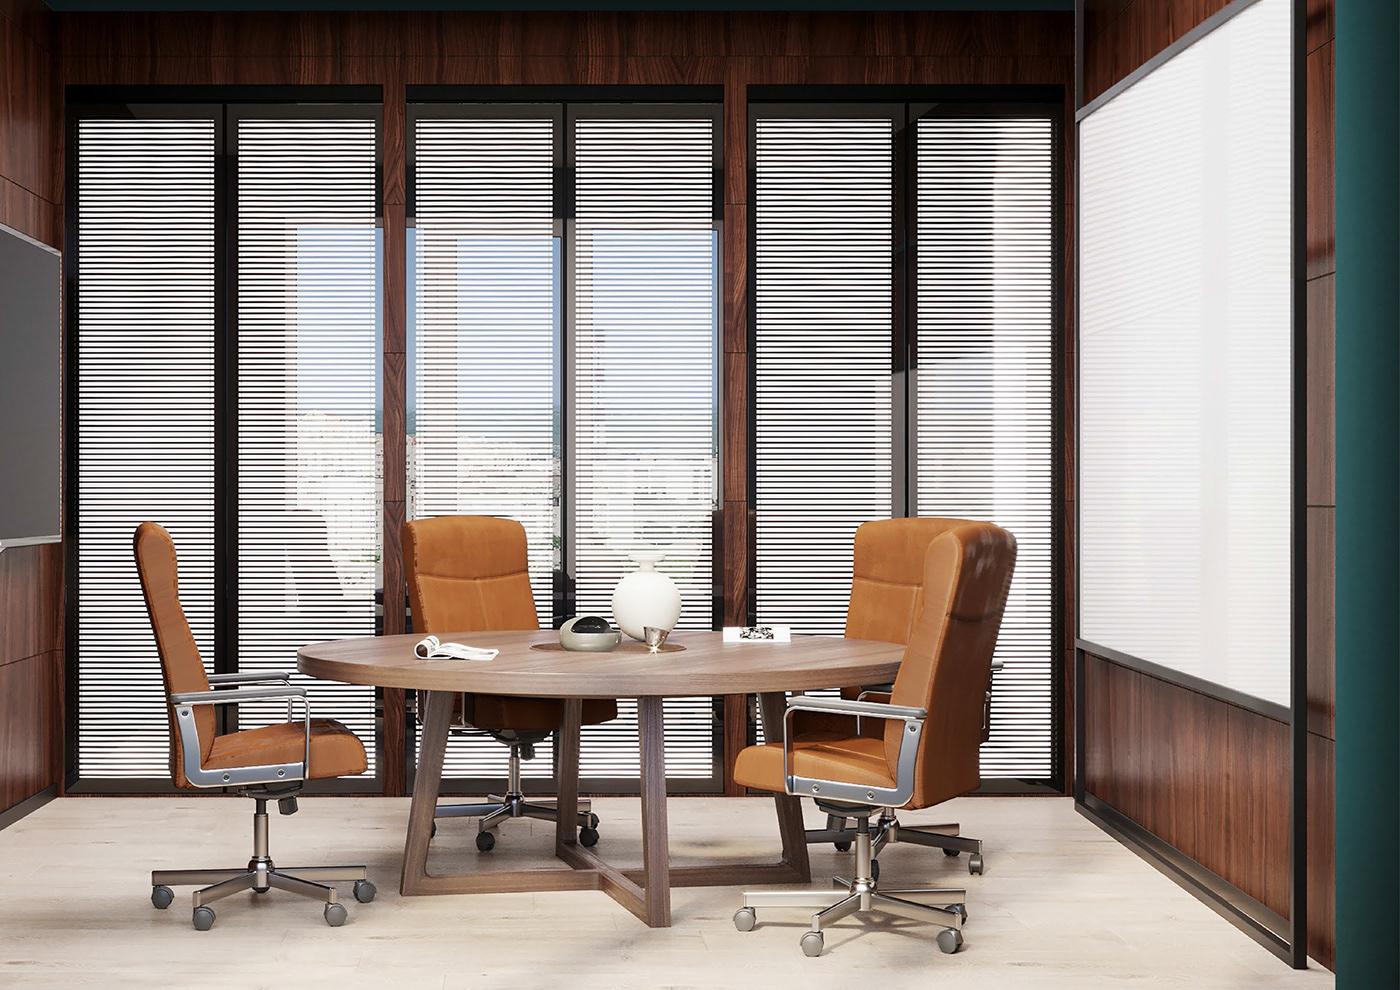 architecture corporate design Interior Office planning saudiarabia Work